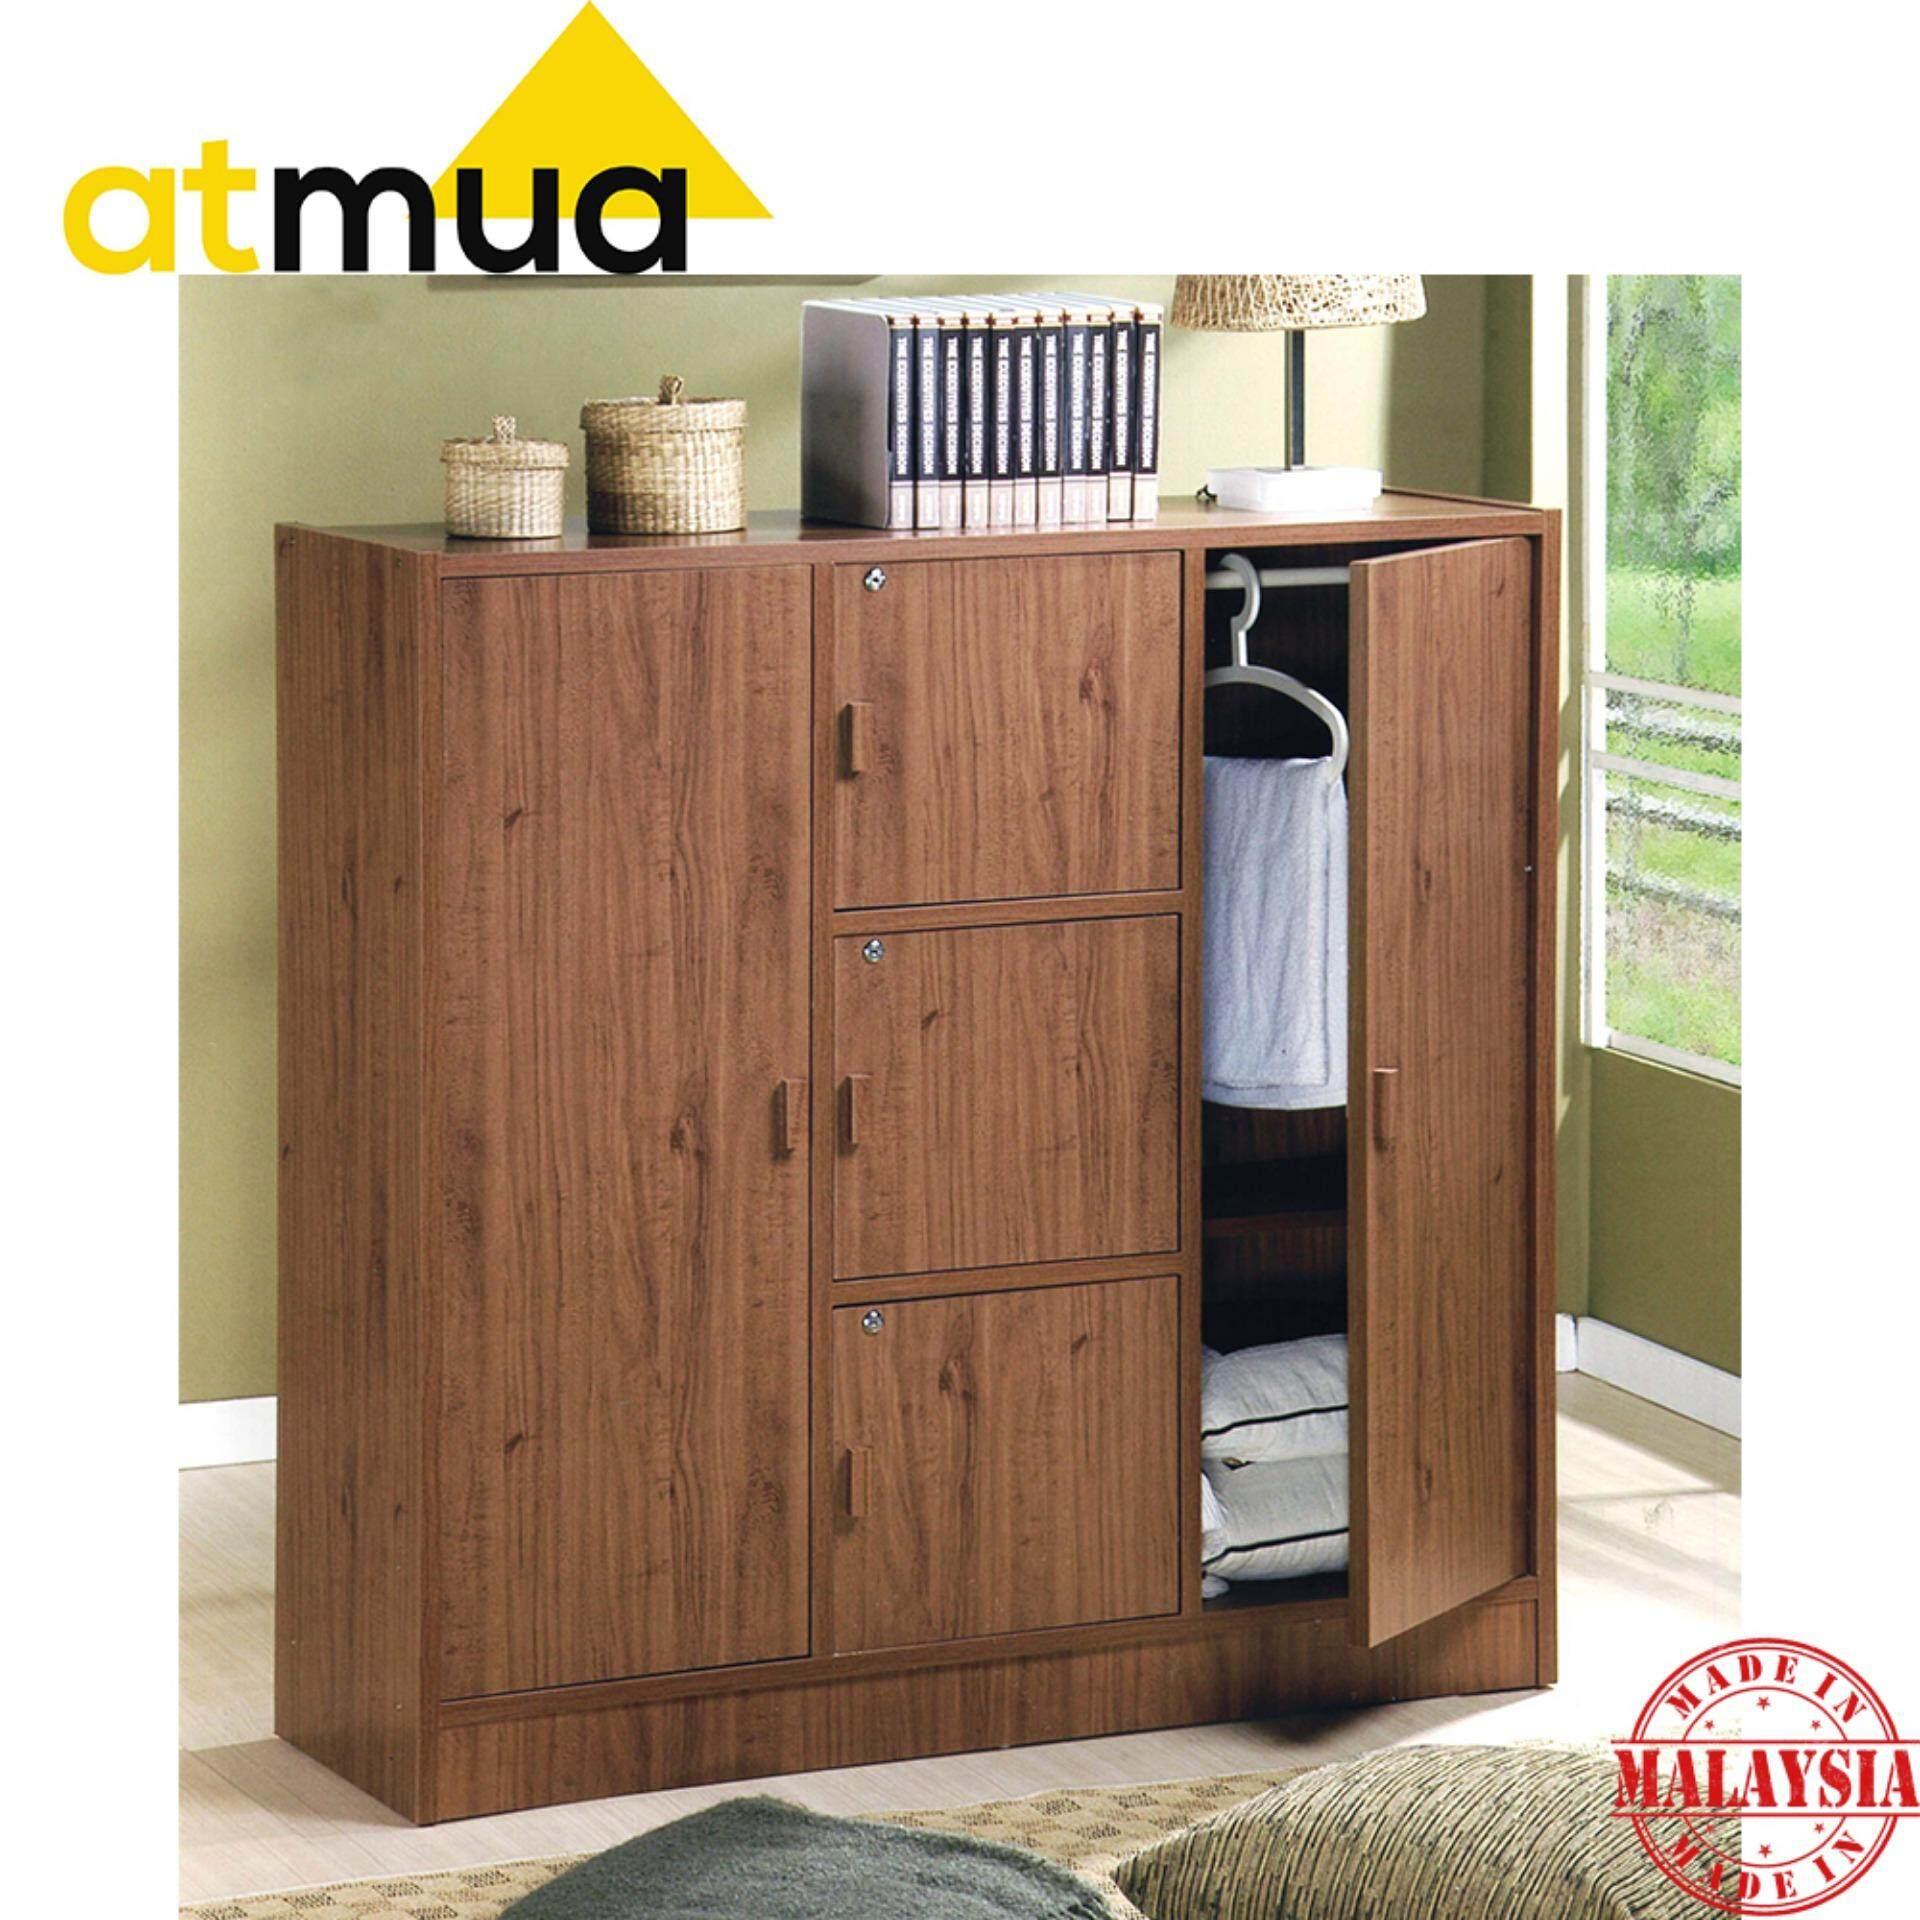 Atmua Nana Children Cabinet Wardrobe [Hollow MDF Board]